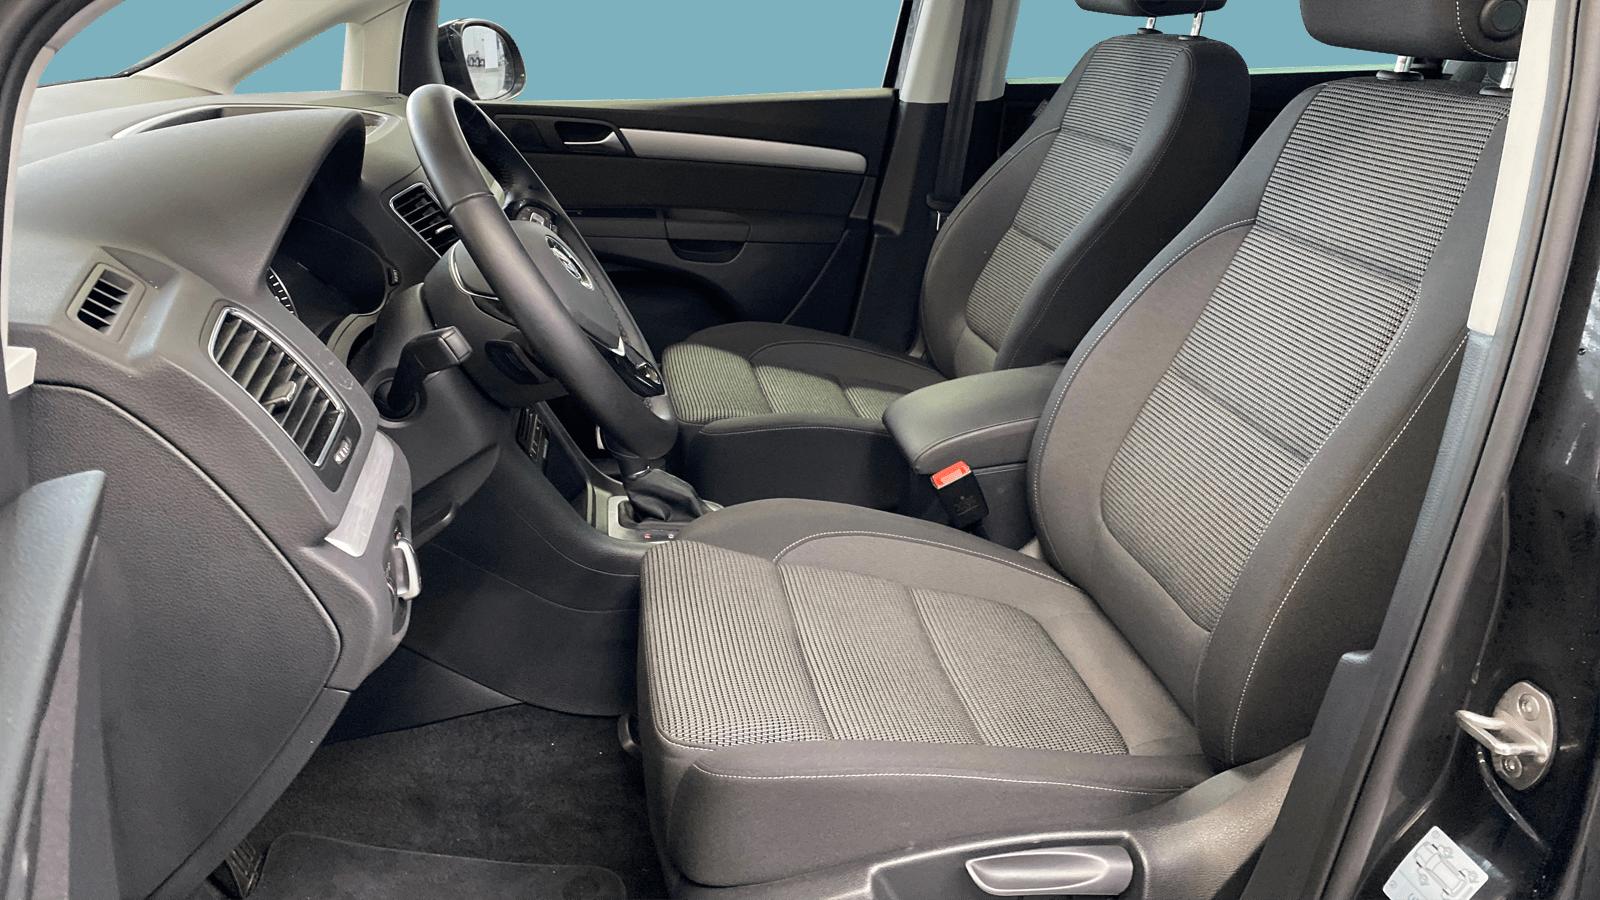 VW Sharan Black interior - Clyde car subscription